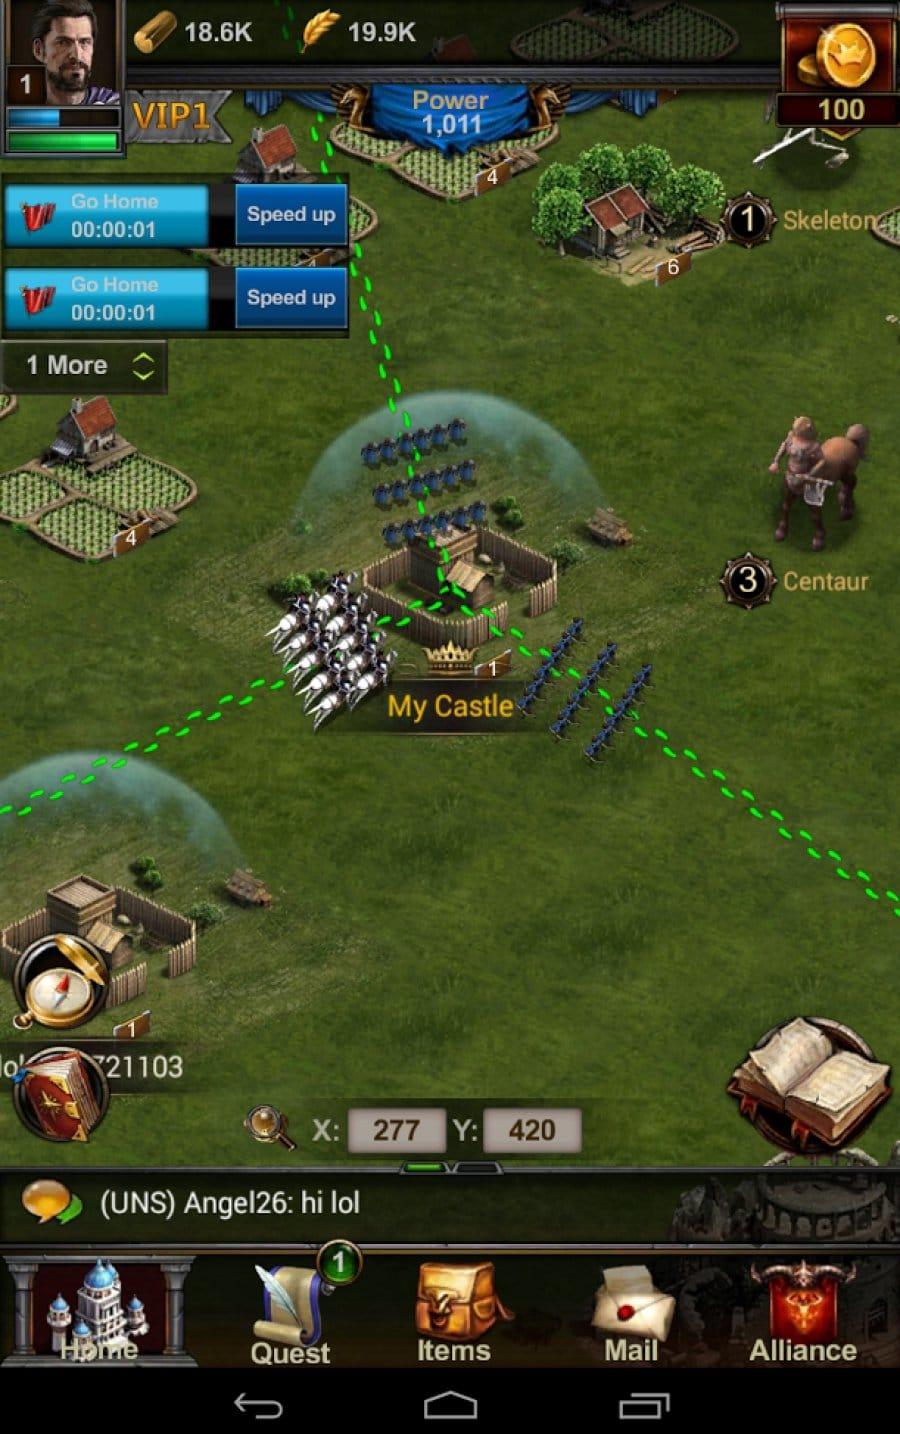 Clash of Kings - картинки, скриншоты